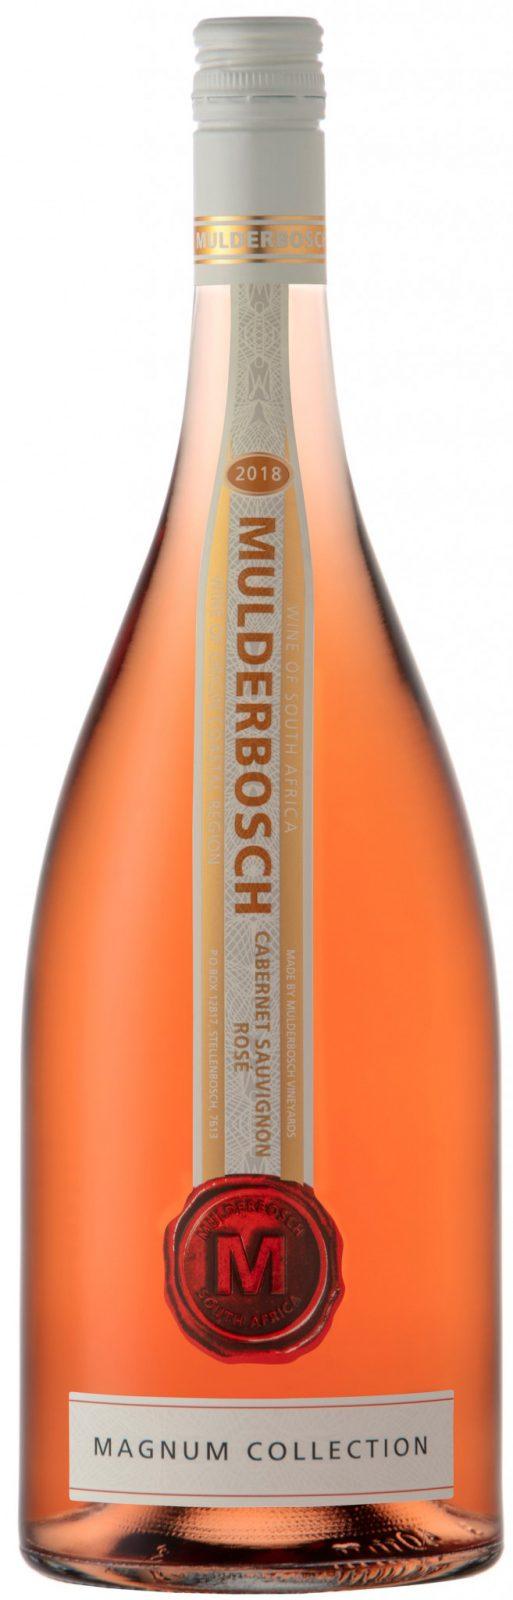 Mulderbosch Rosé magnum - wineaffair